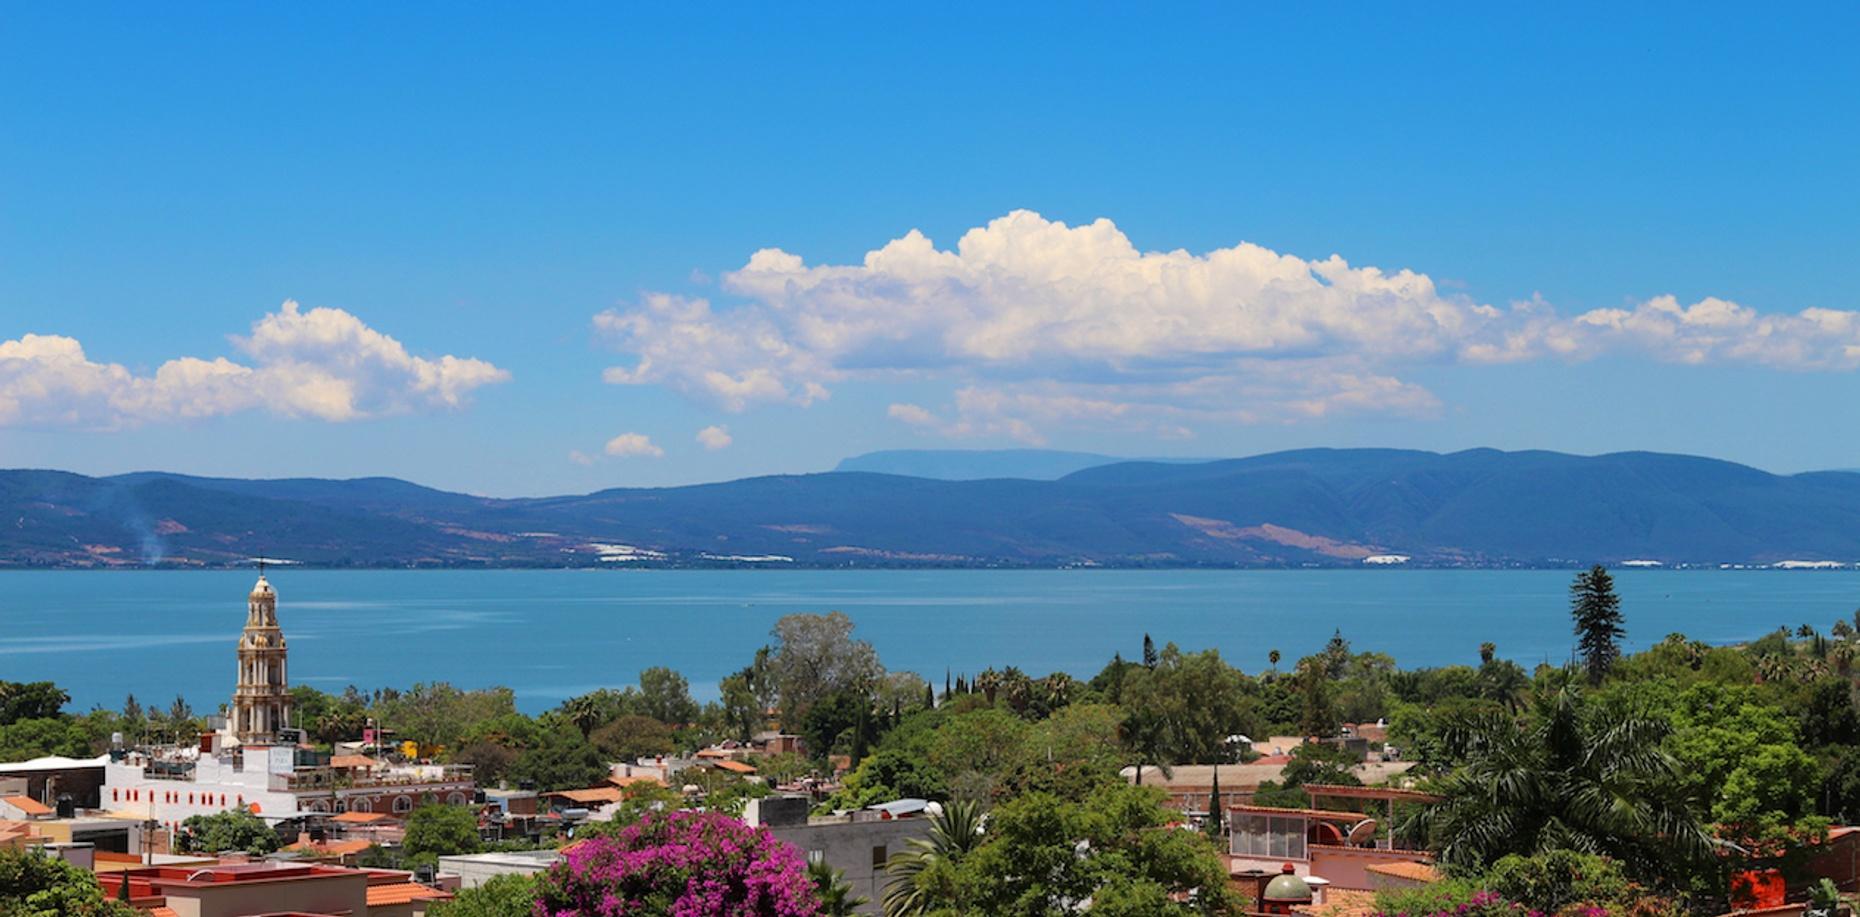 Guided Tour of Lake Chapala and Ajijic in Guadalajara